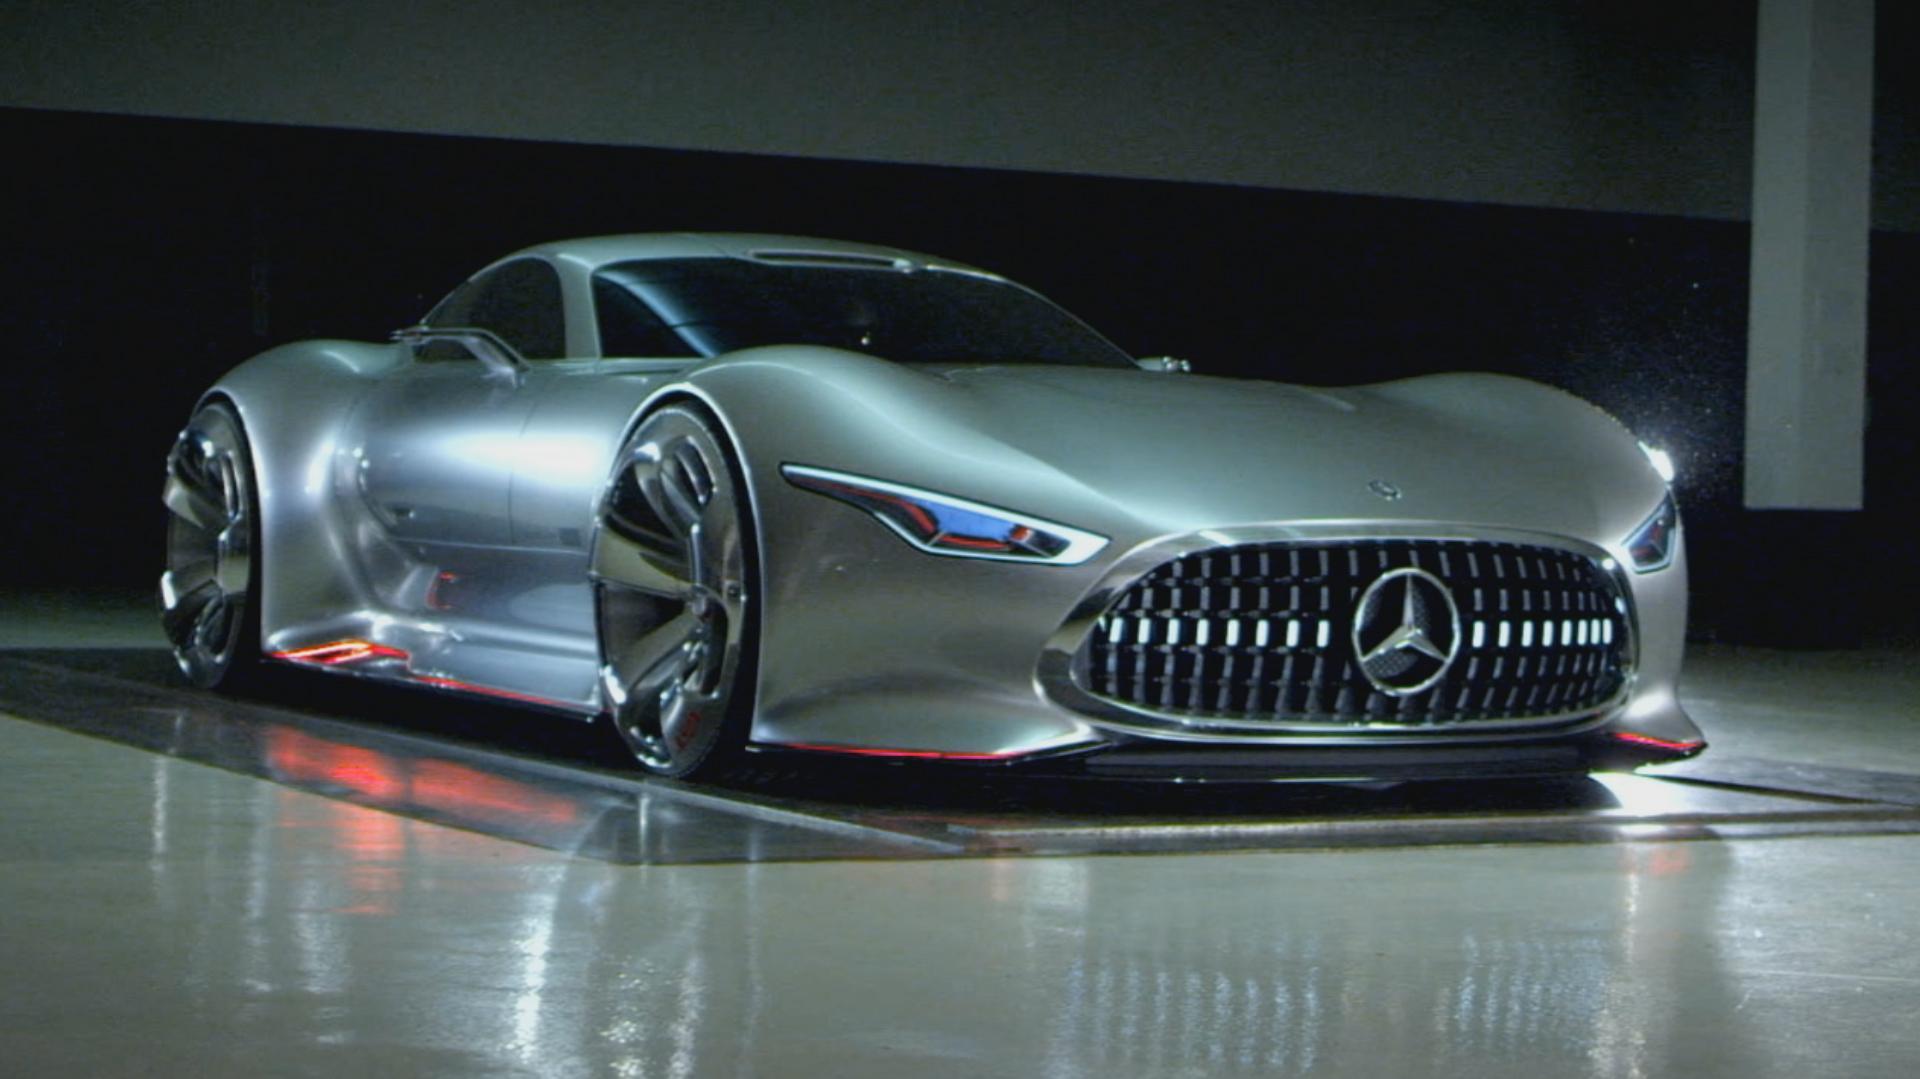 Gran Turismo 6 Get 20 Million Credits For Free